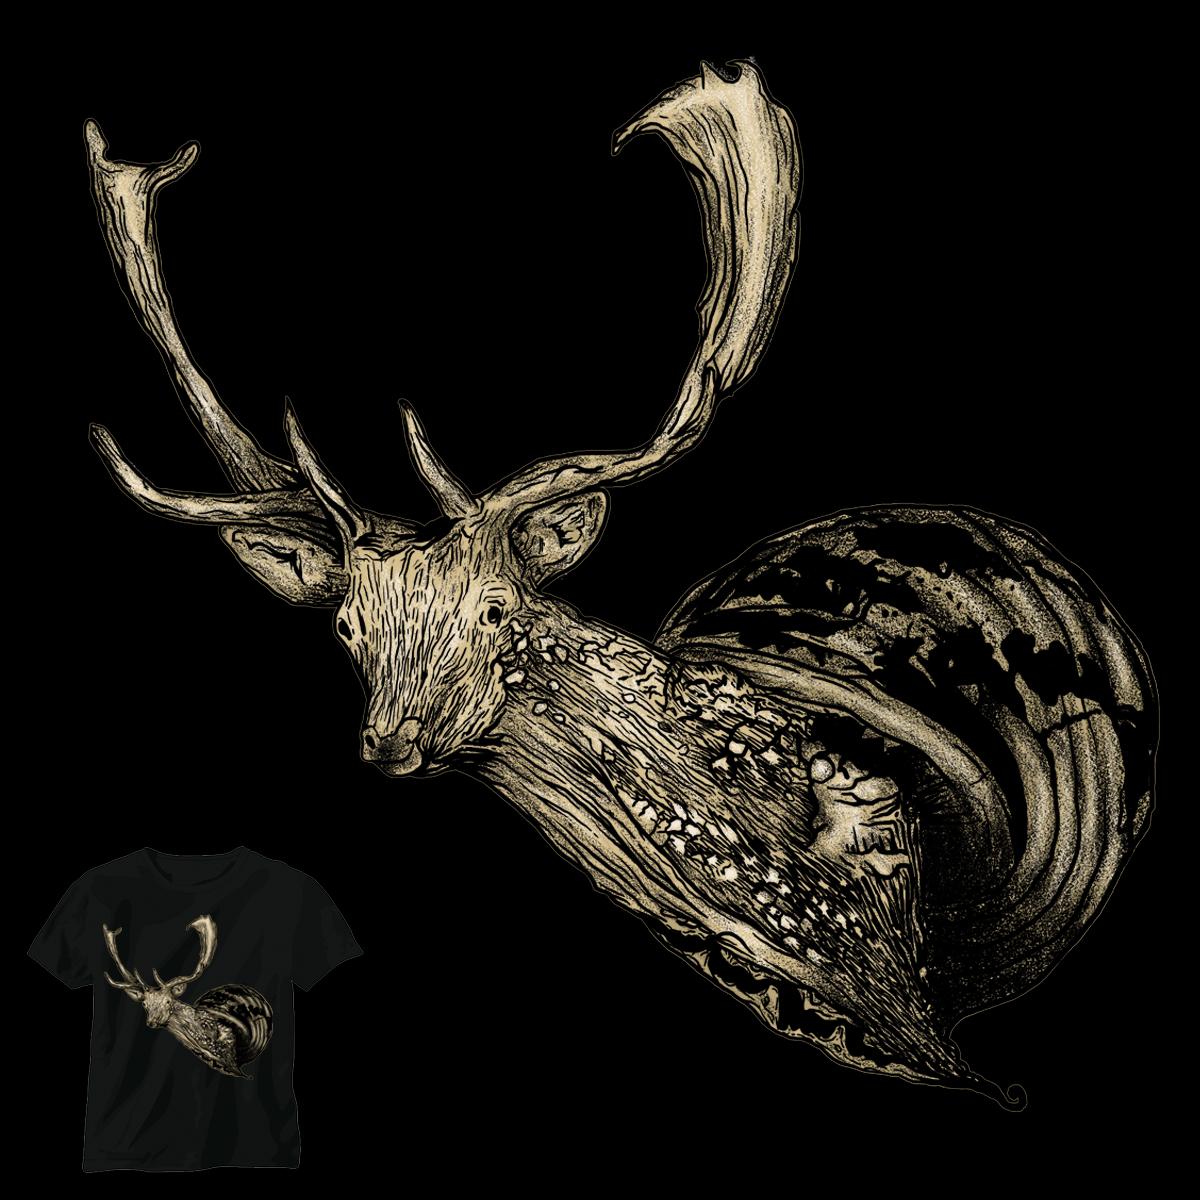 deerslugs by gupikus on Threadless